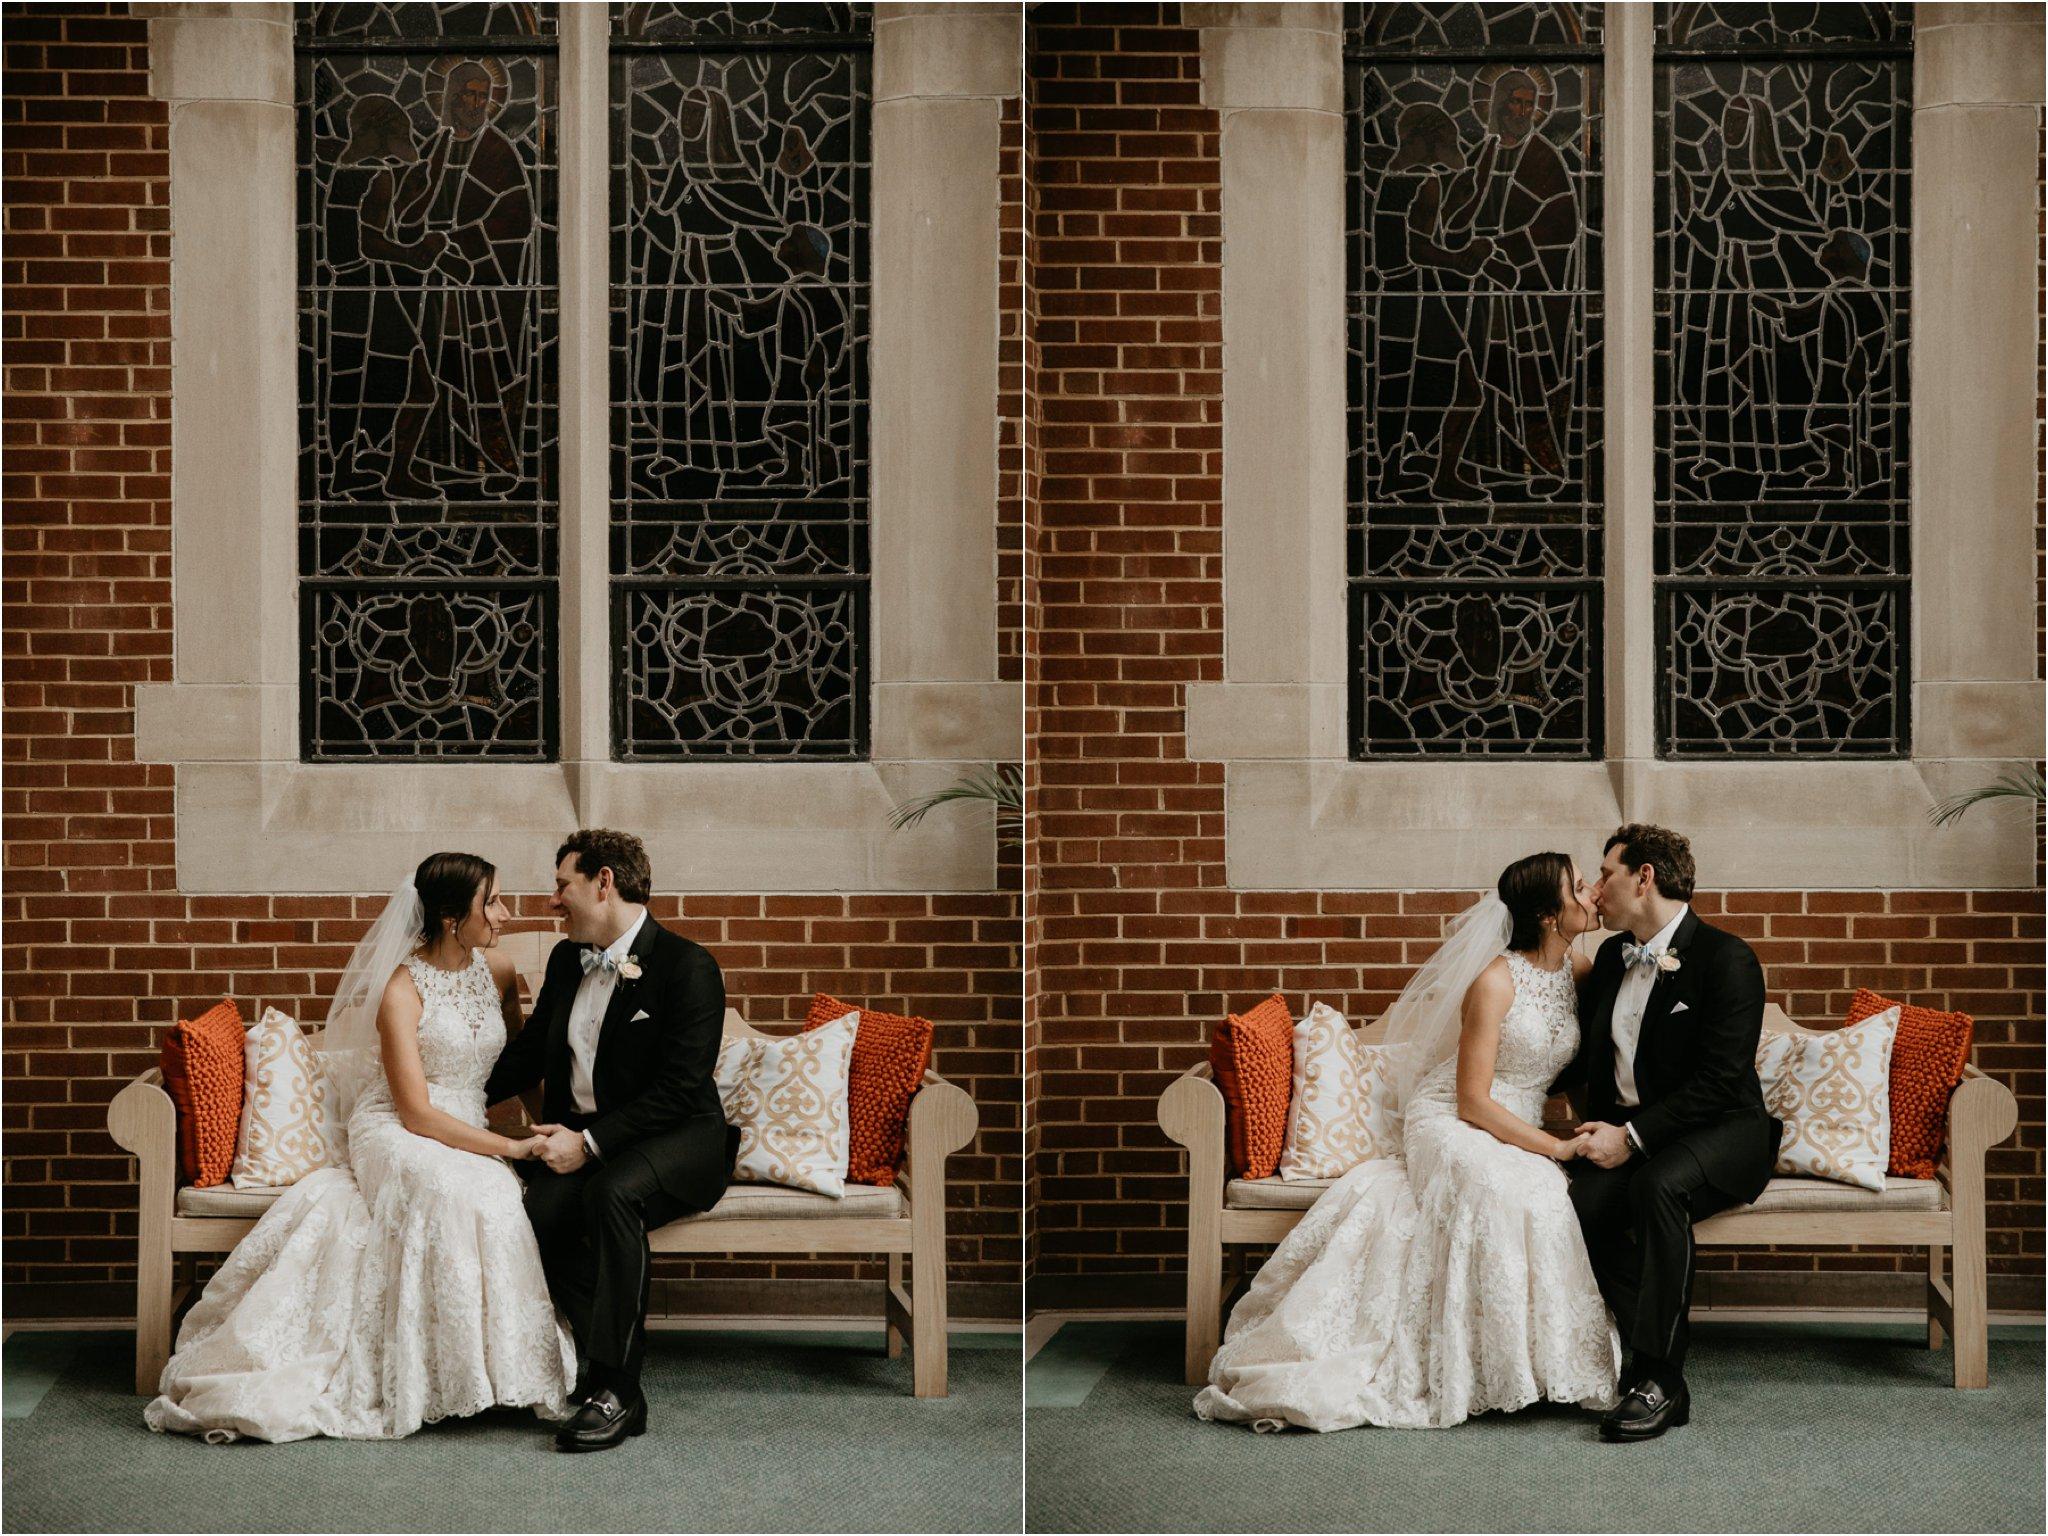 Patrick Henry Ballroom - Weddings - Virginia Wedding Photographer - Pat Cori Photography-80.jpg